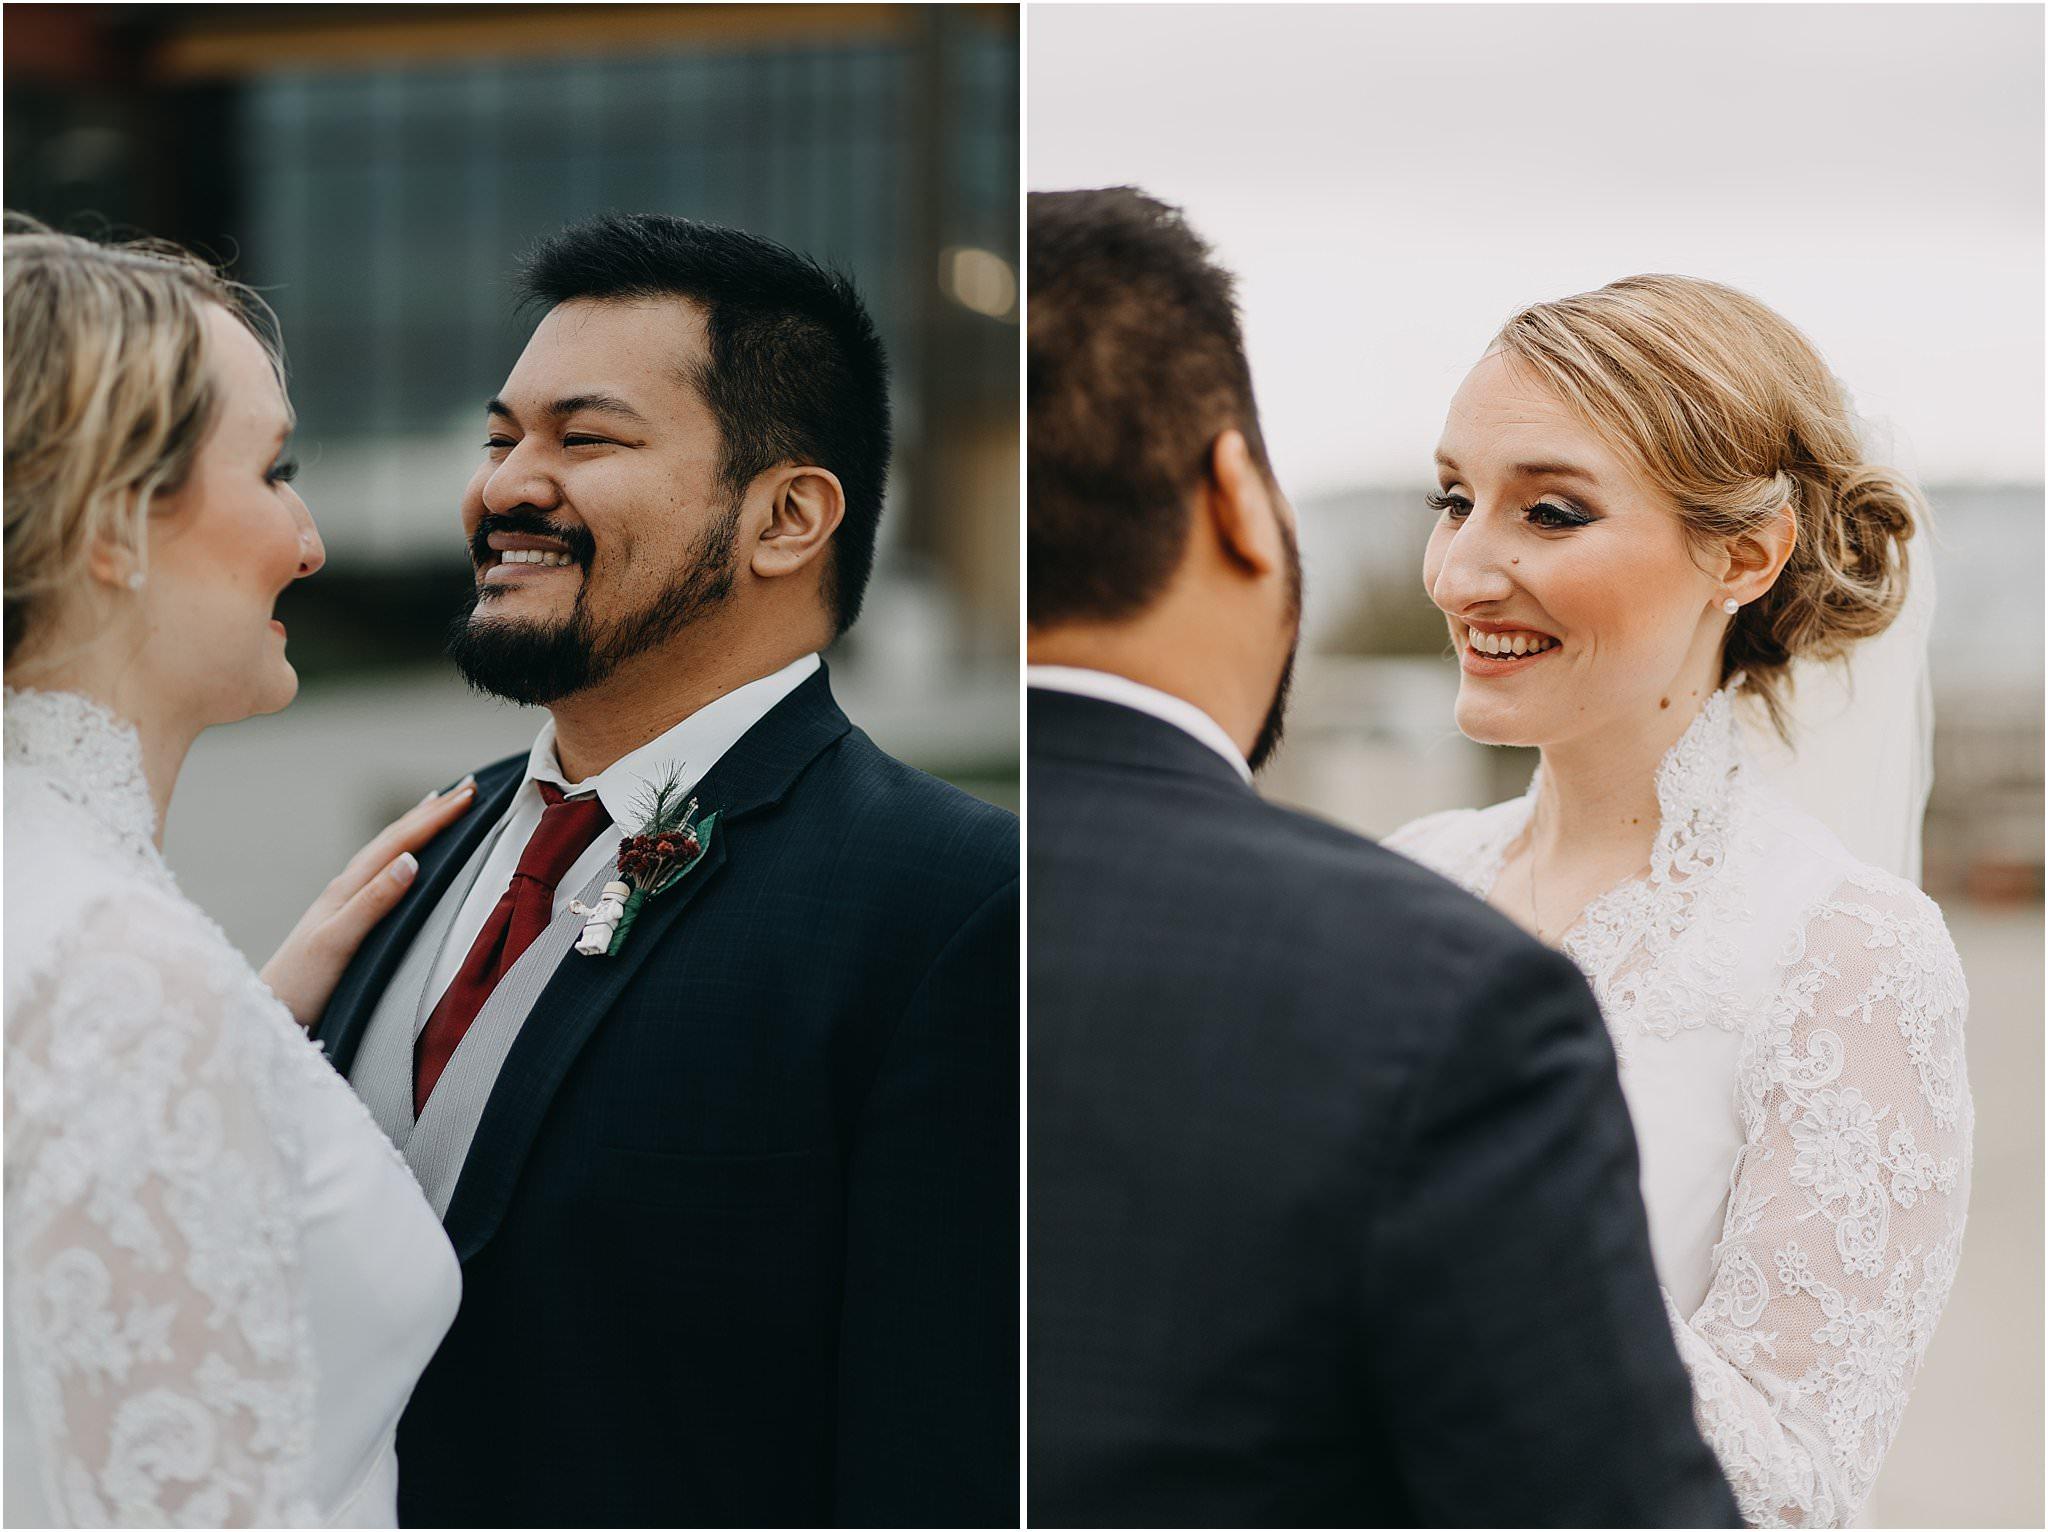 katy-robin-married-in-mukilteo-wedding20.jpg